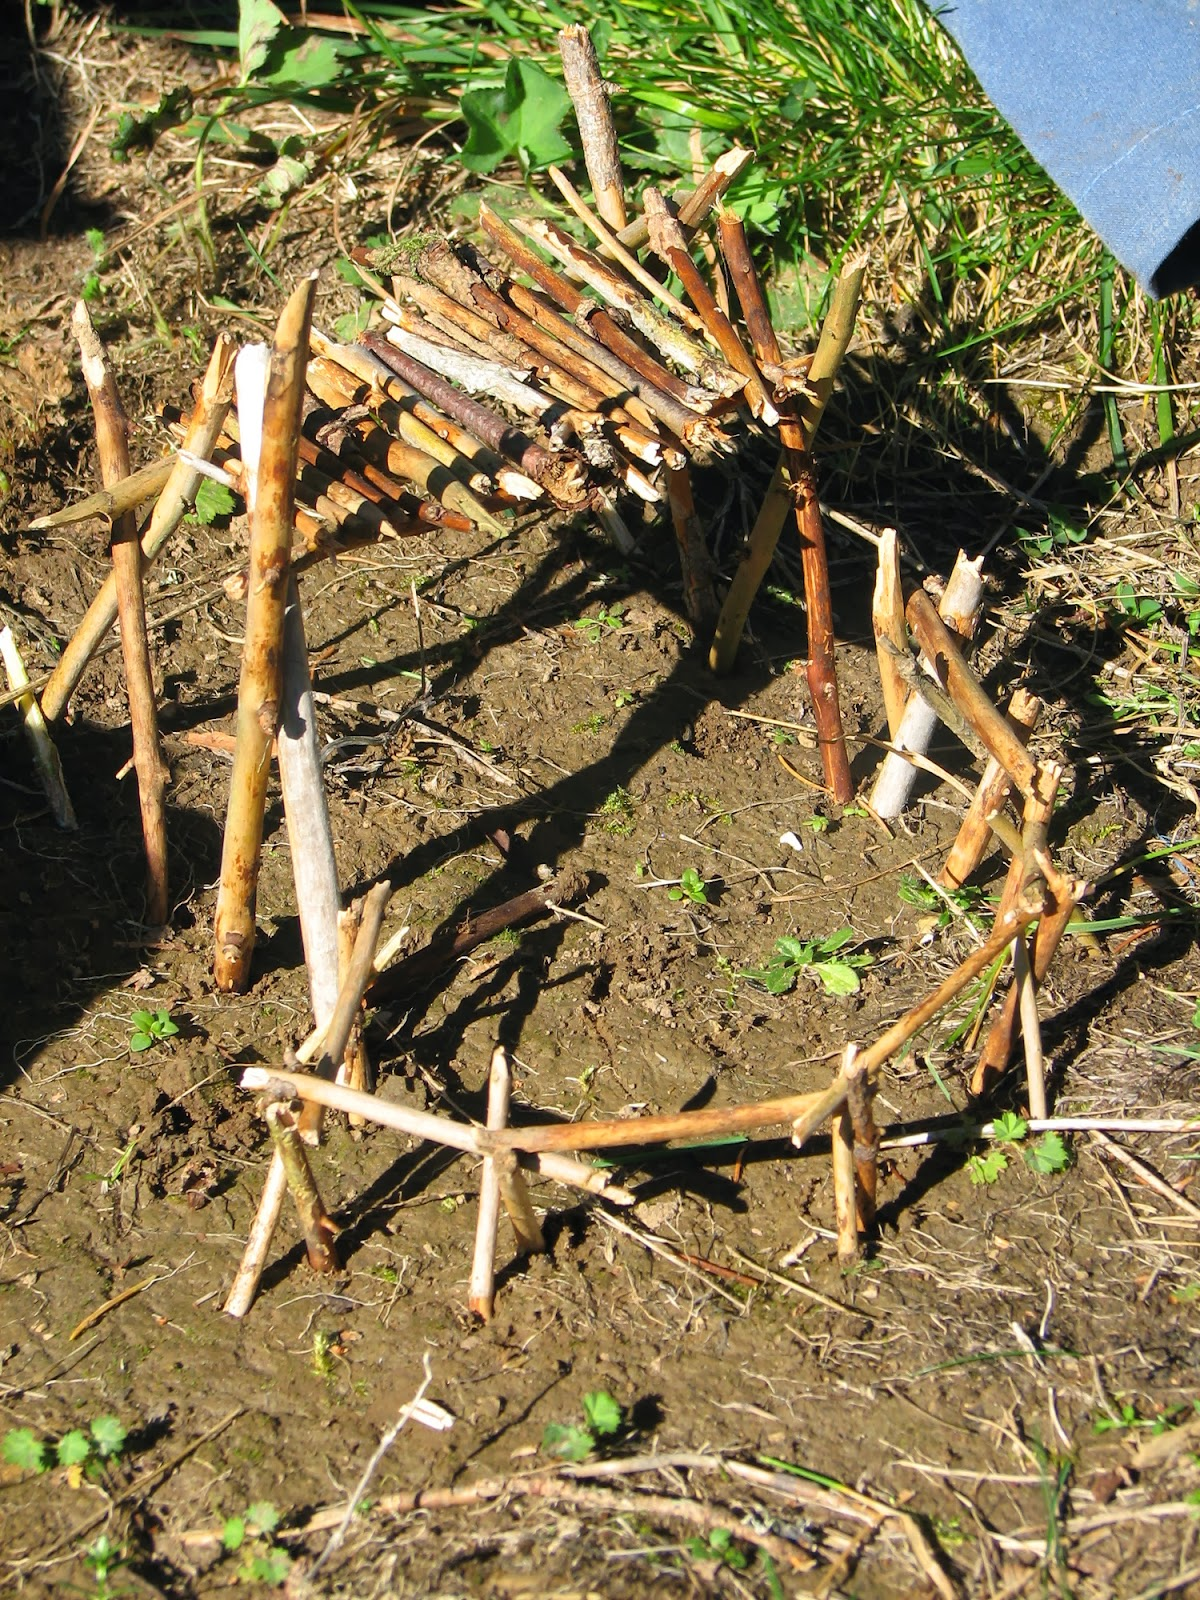 Vodov izlet, Ilirska Bistrica 2005 - Picture%2B179.jpg